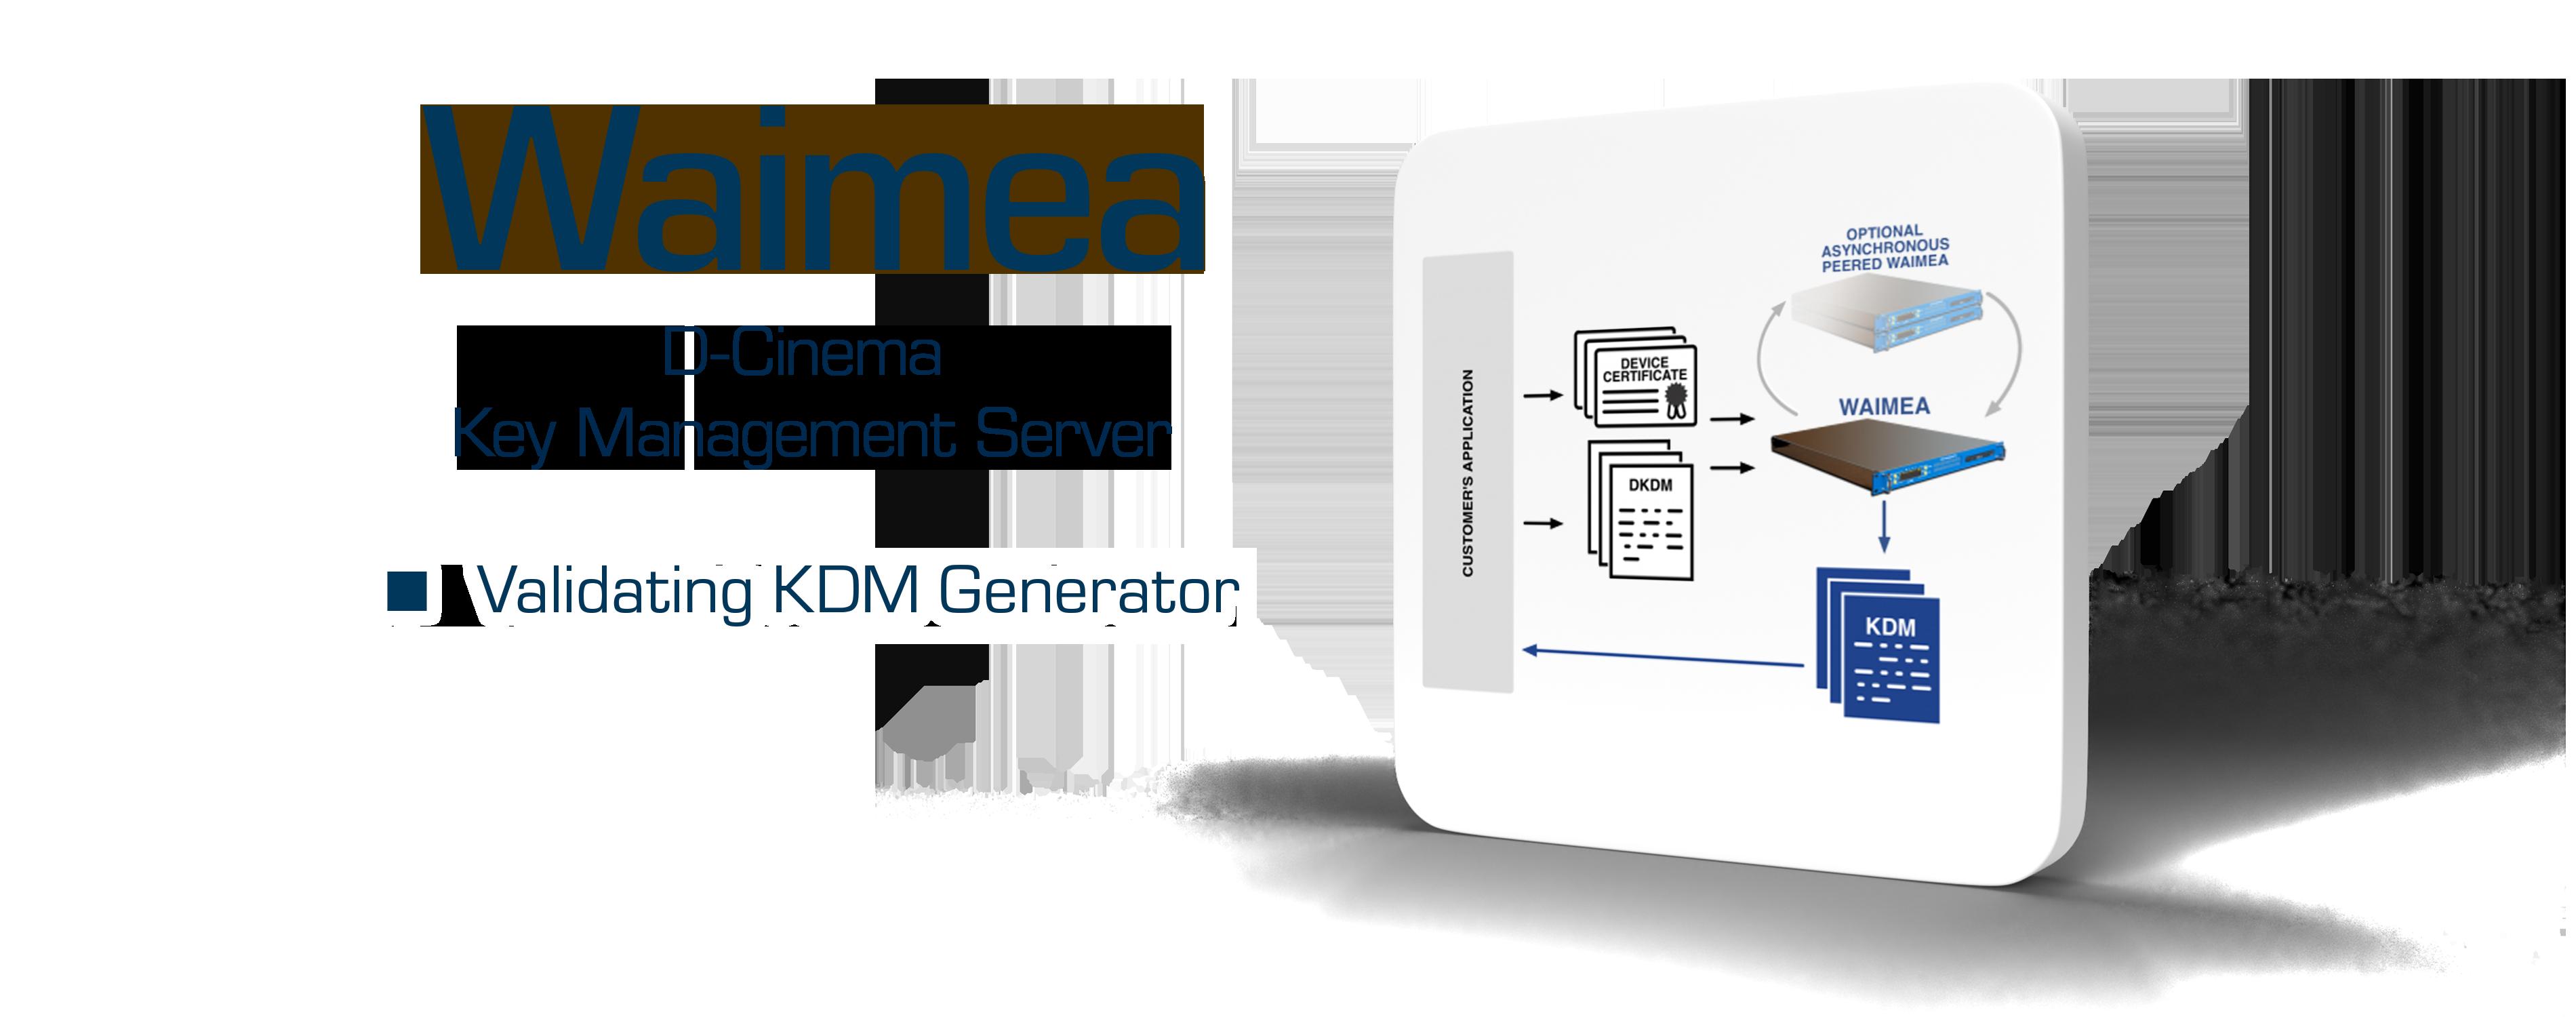 Waimea - Digital Cinema Key Management Server - Validating KDM Generator